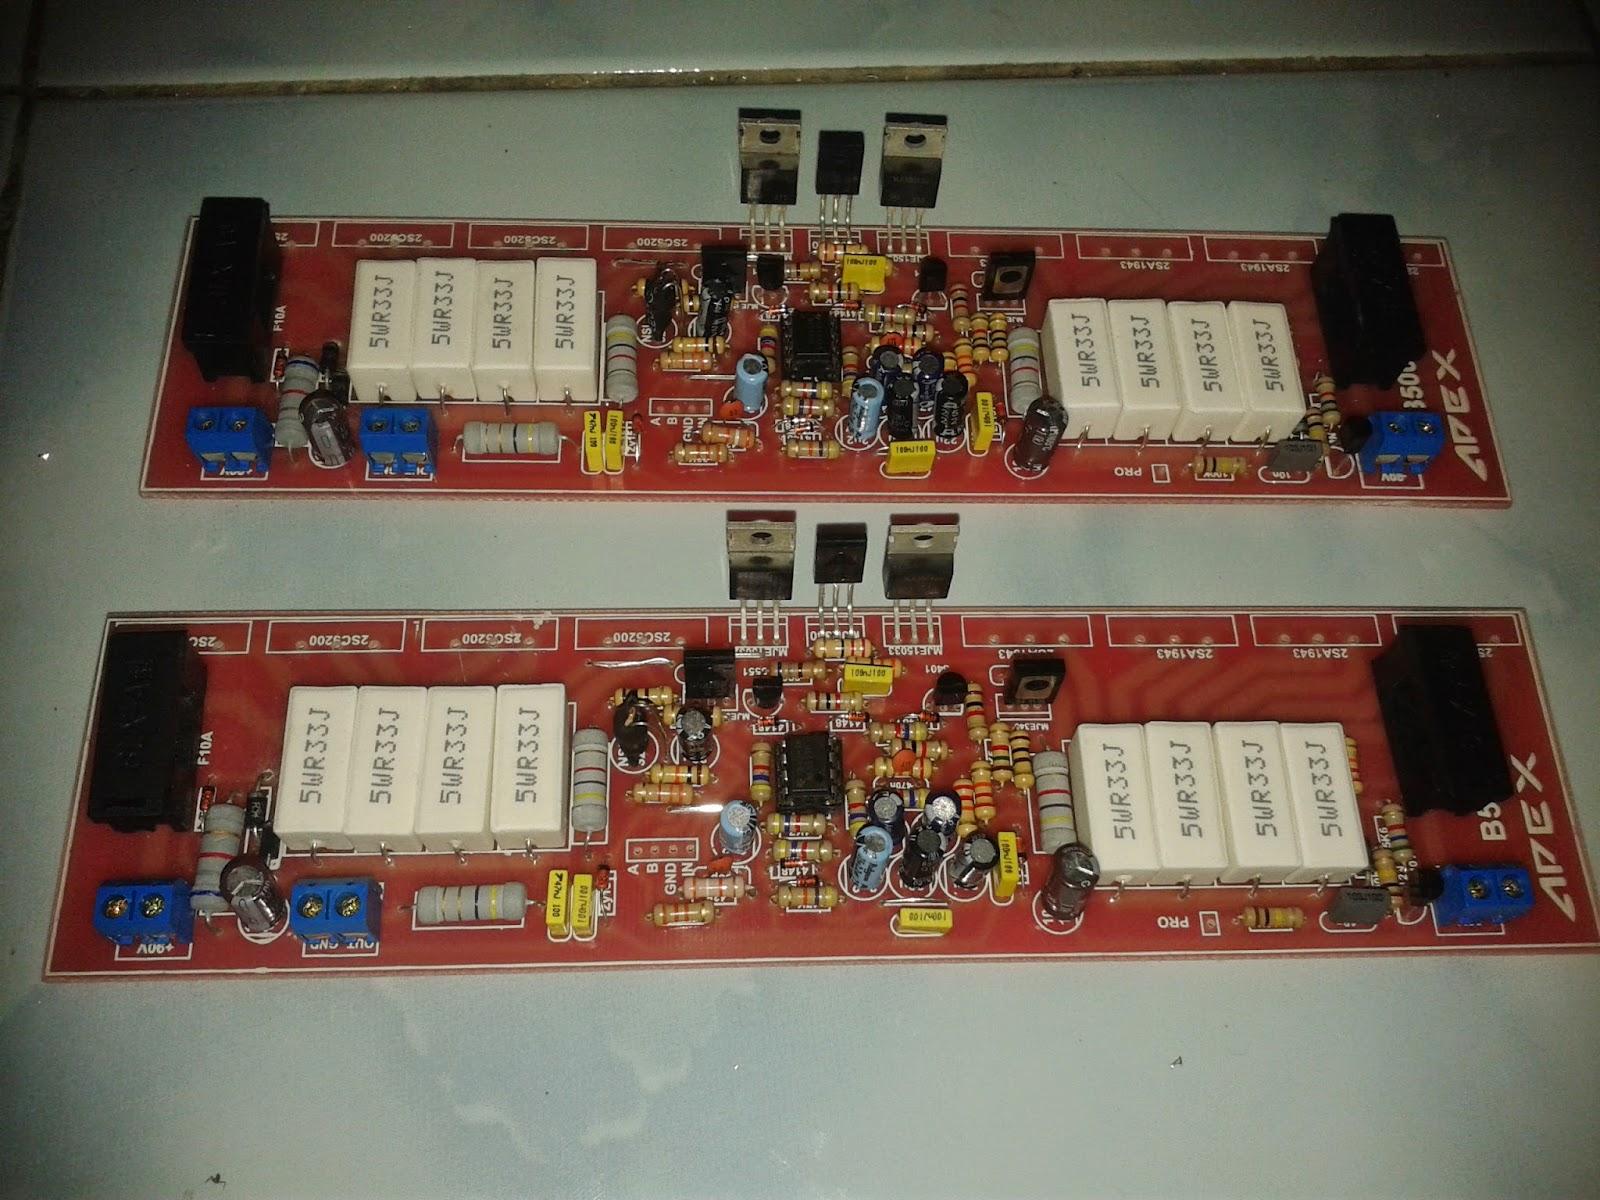 12v 100ah Battery Charger Circuit Diagram 1984 Chevy Truck Power Window Wiring Elektronika 25 Skema Rangkaian